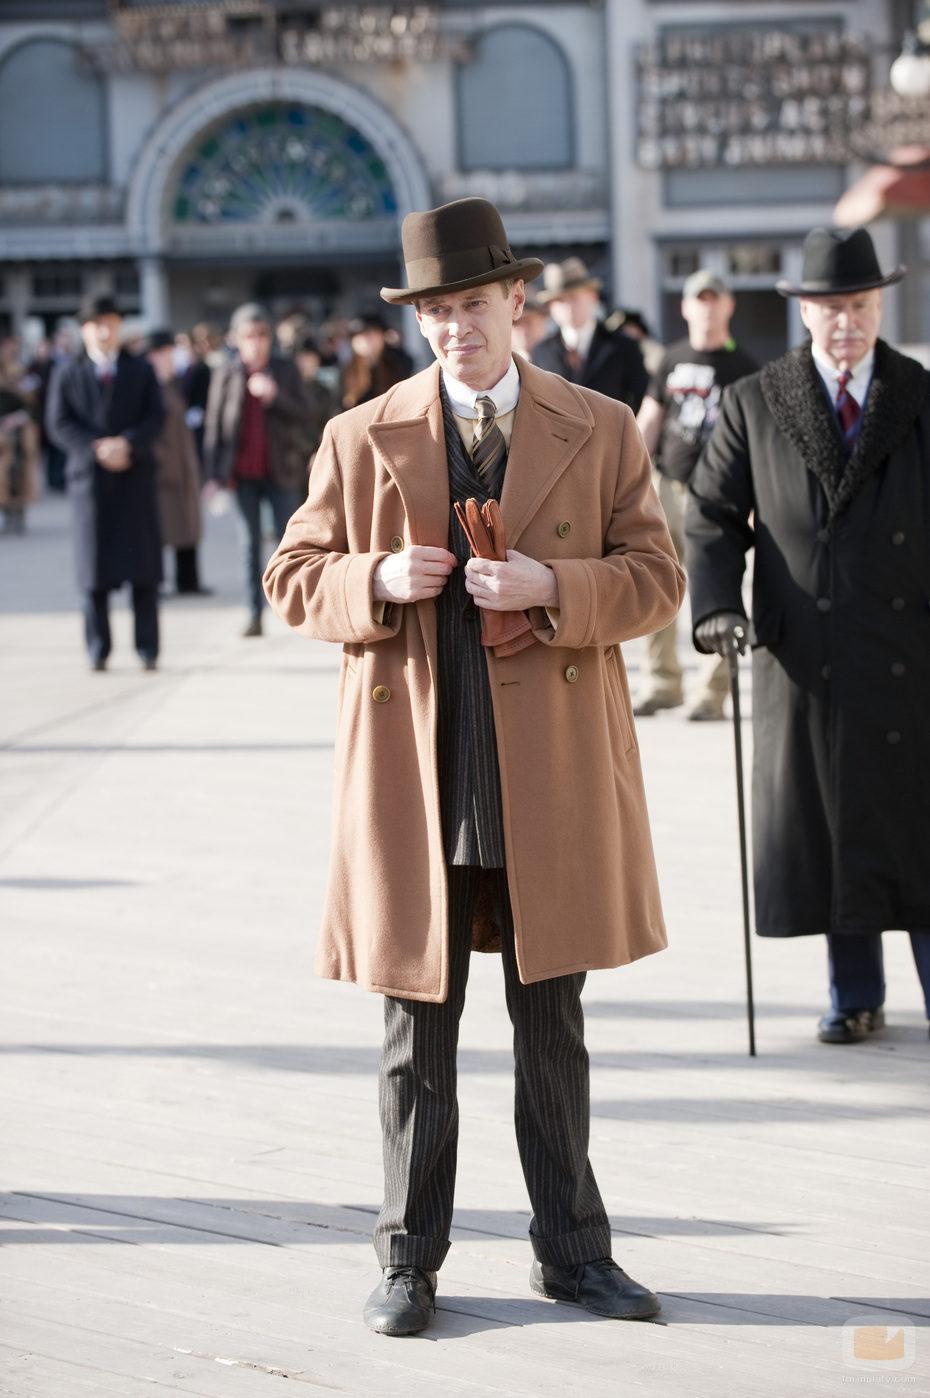 El actor Steve Buscemi en 'Boardwalk Empire'